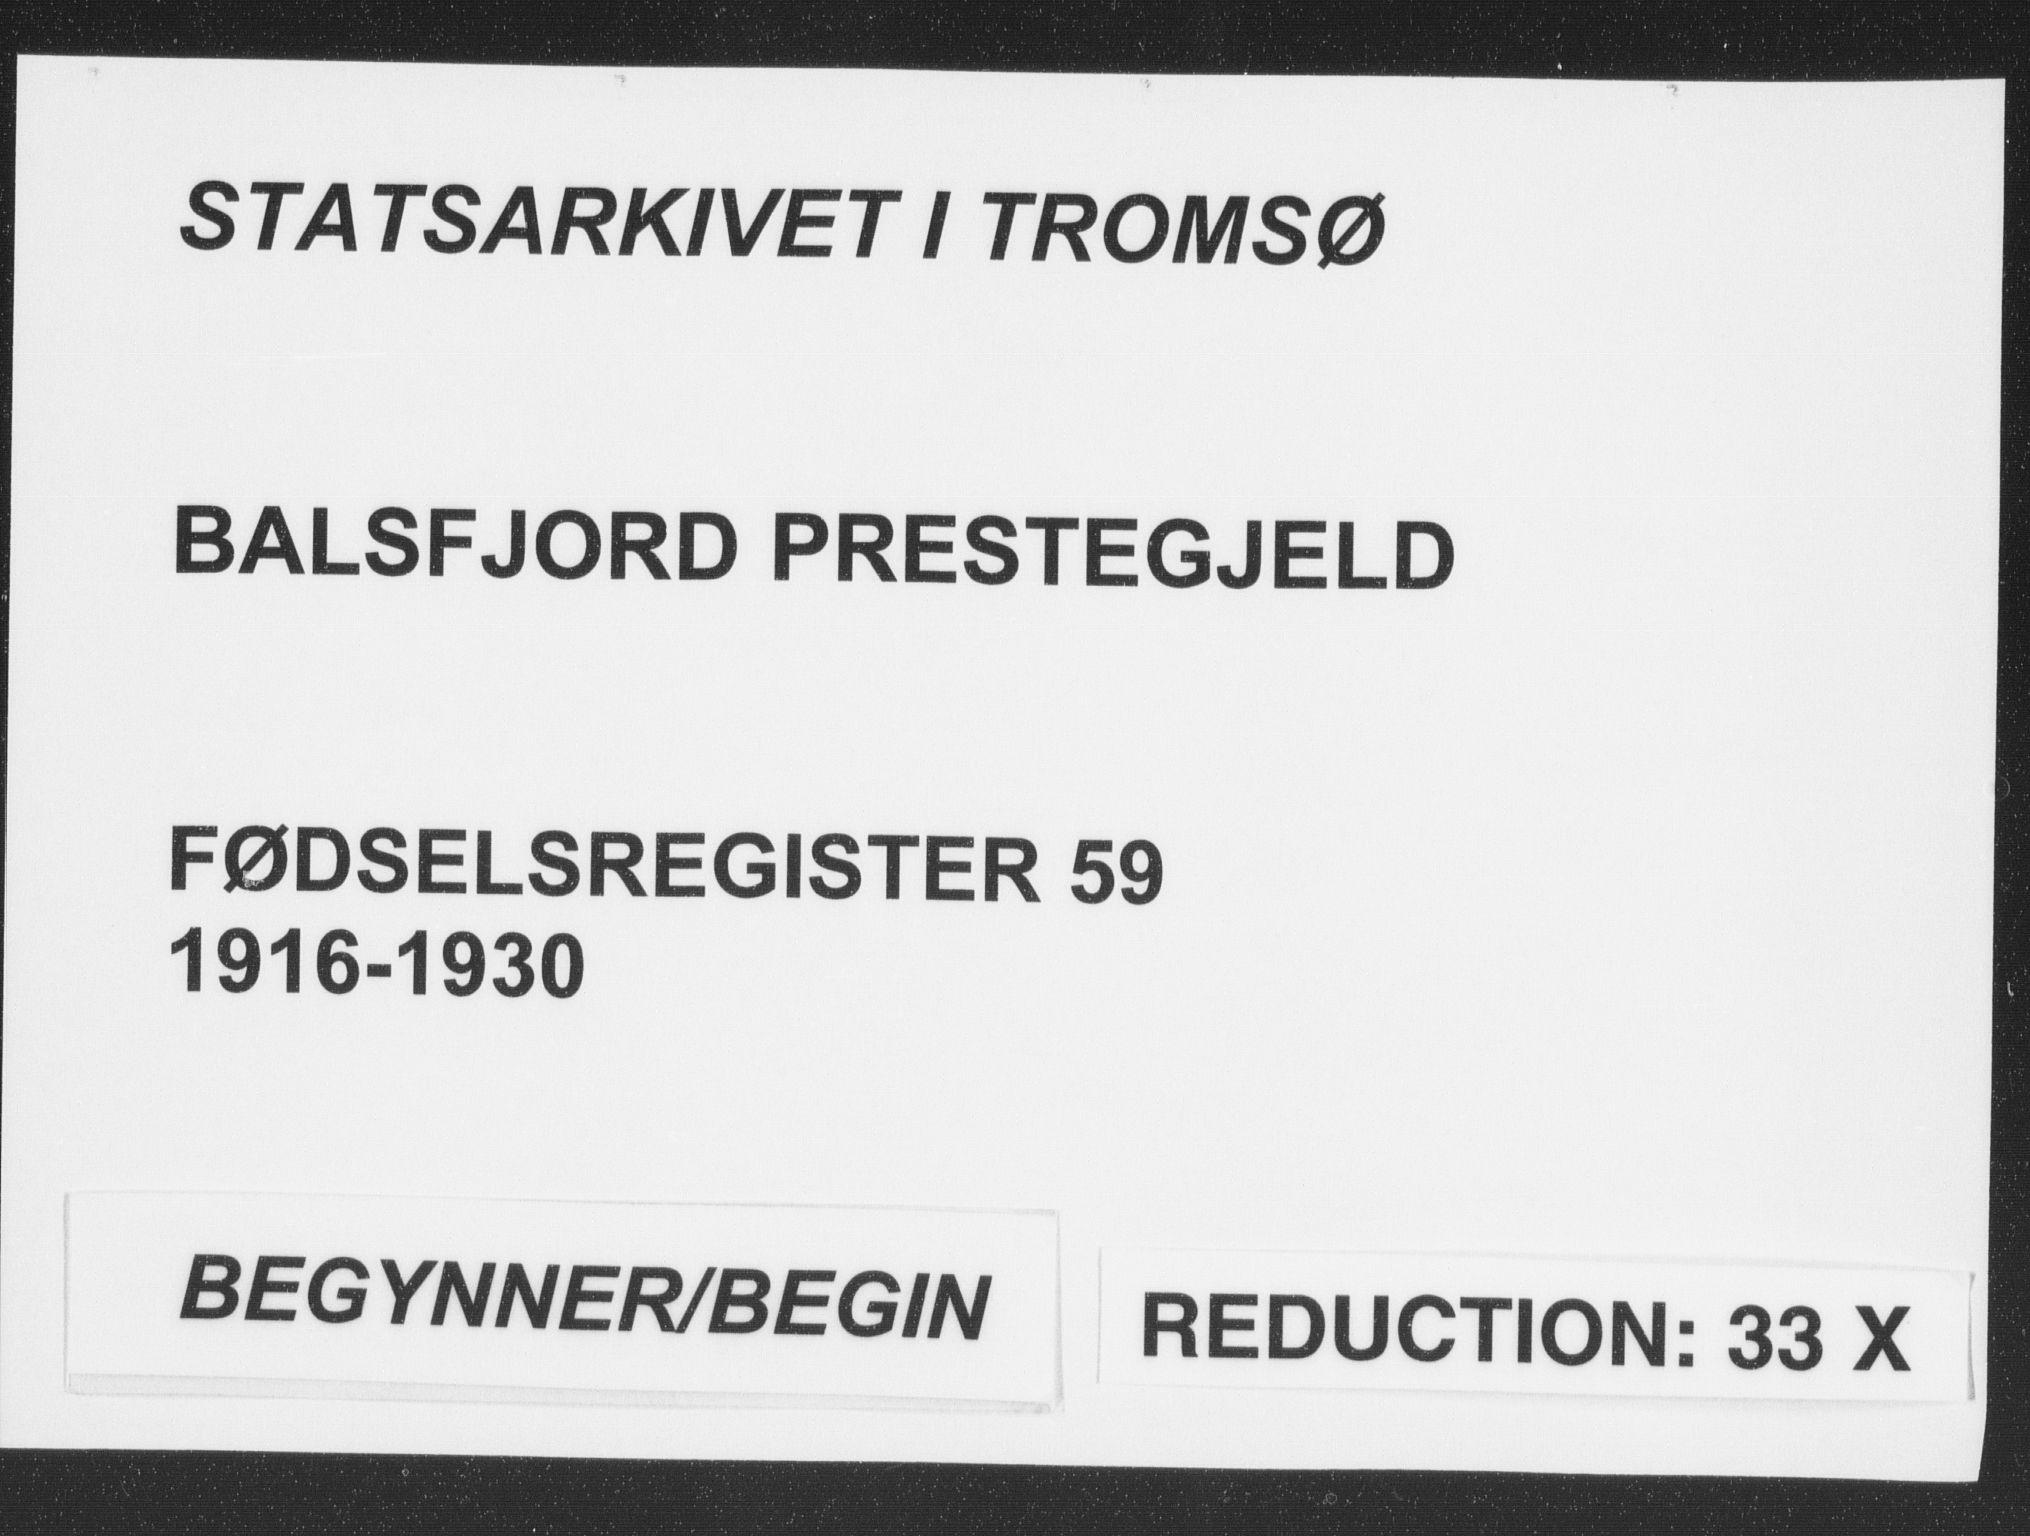 SATØ, Balsfjord sokneprestembete, Birth register no. 59, 1916-1930